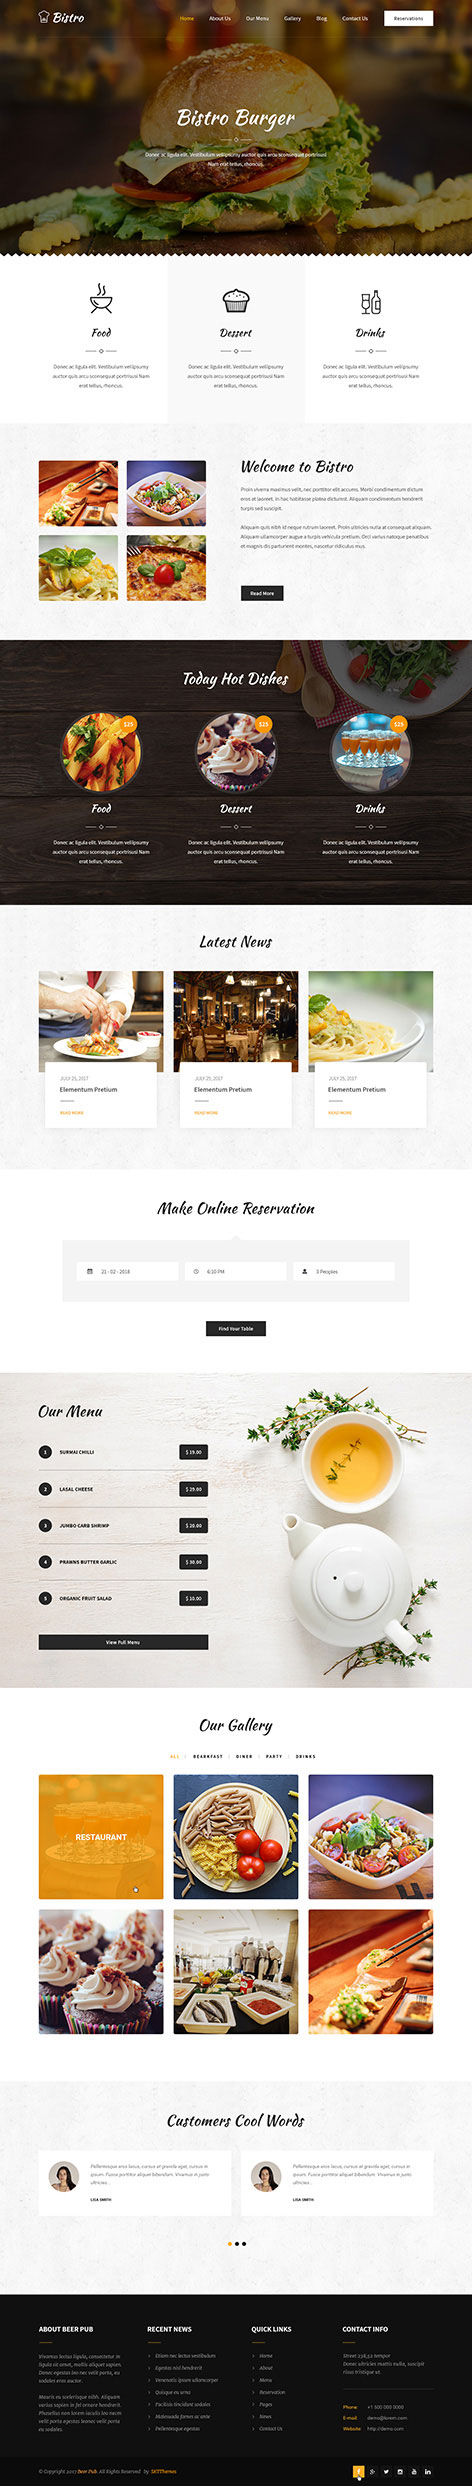 food wordPress theme1 - Bistro